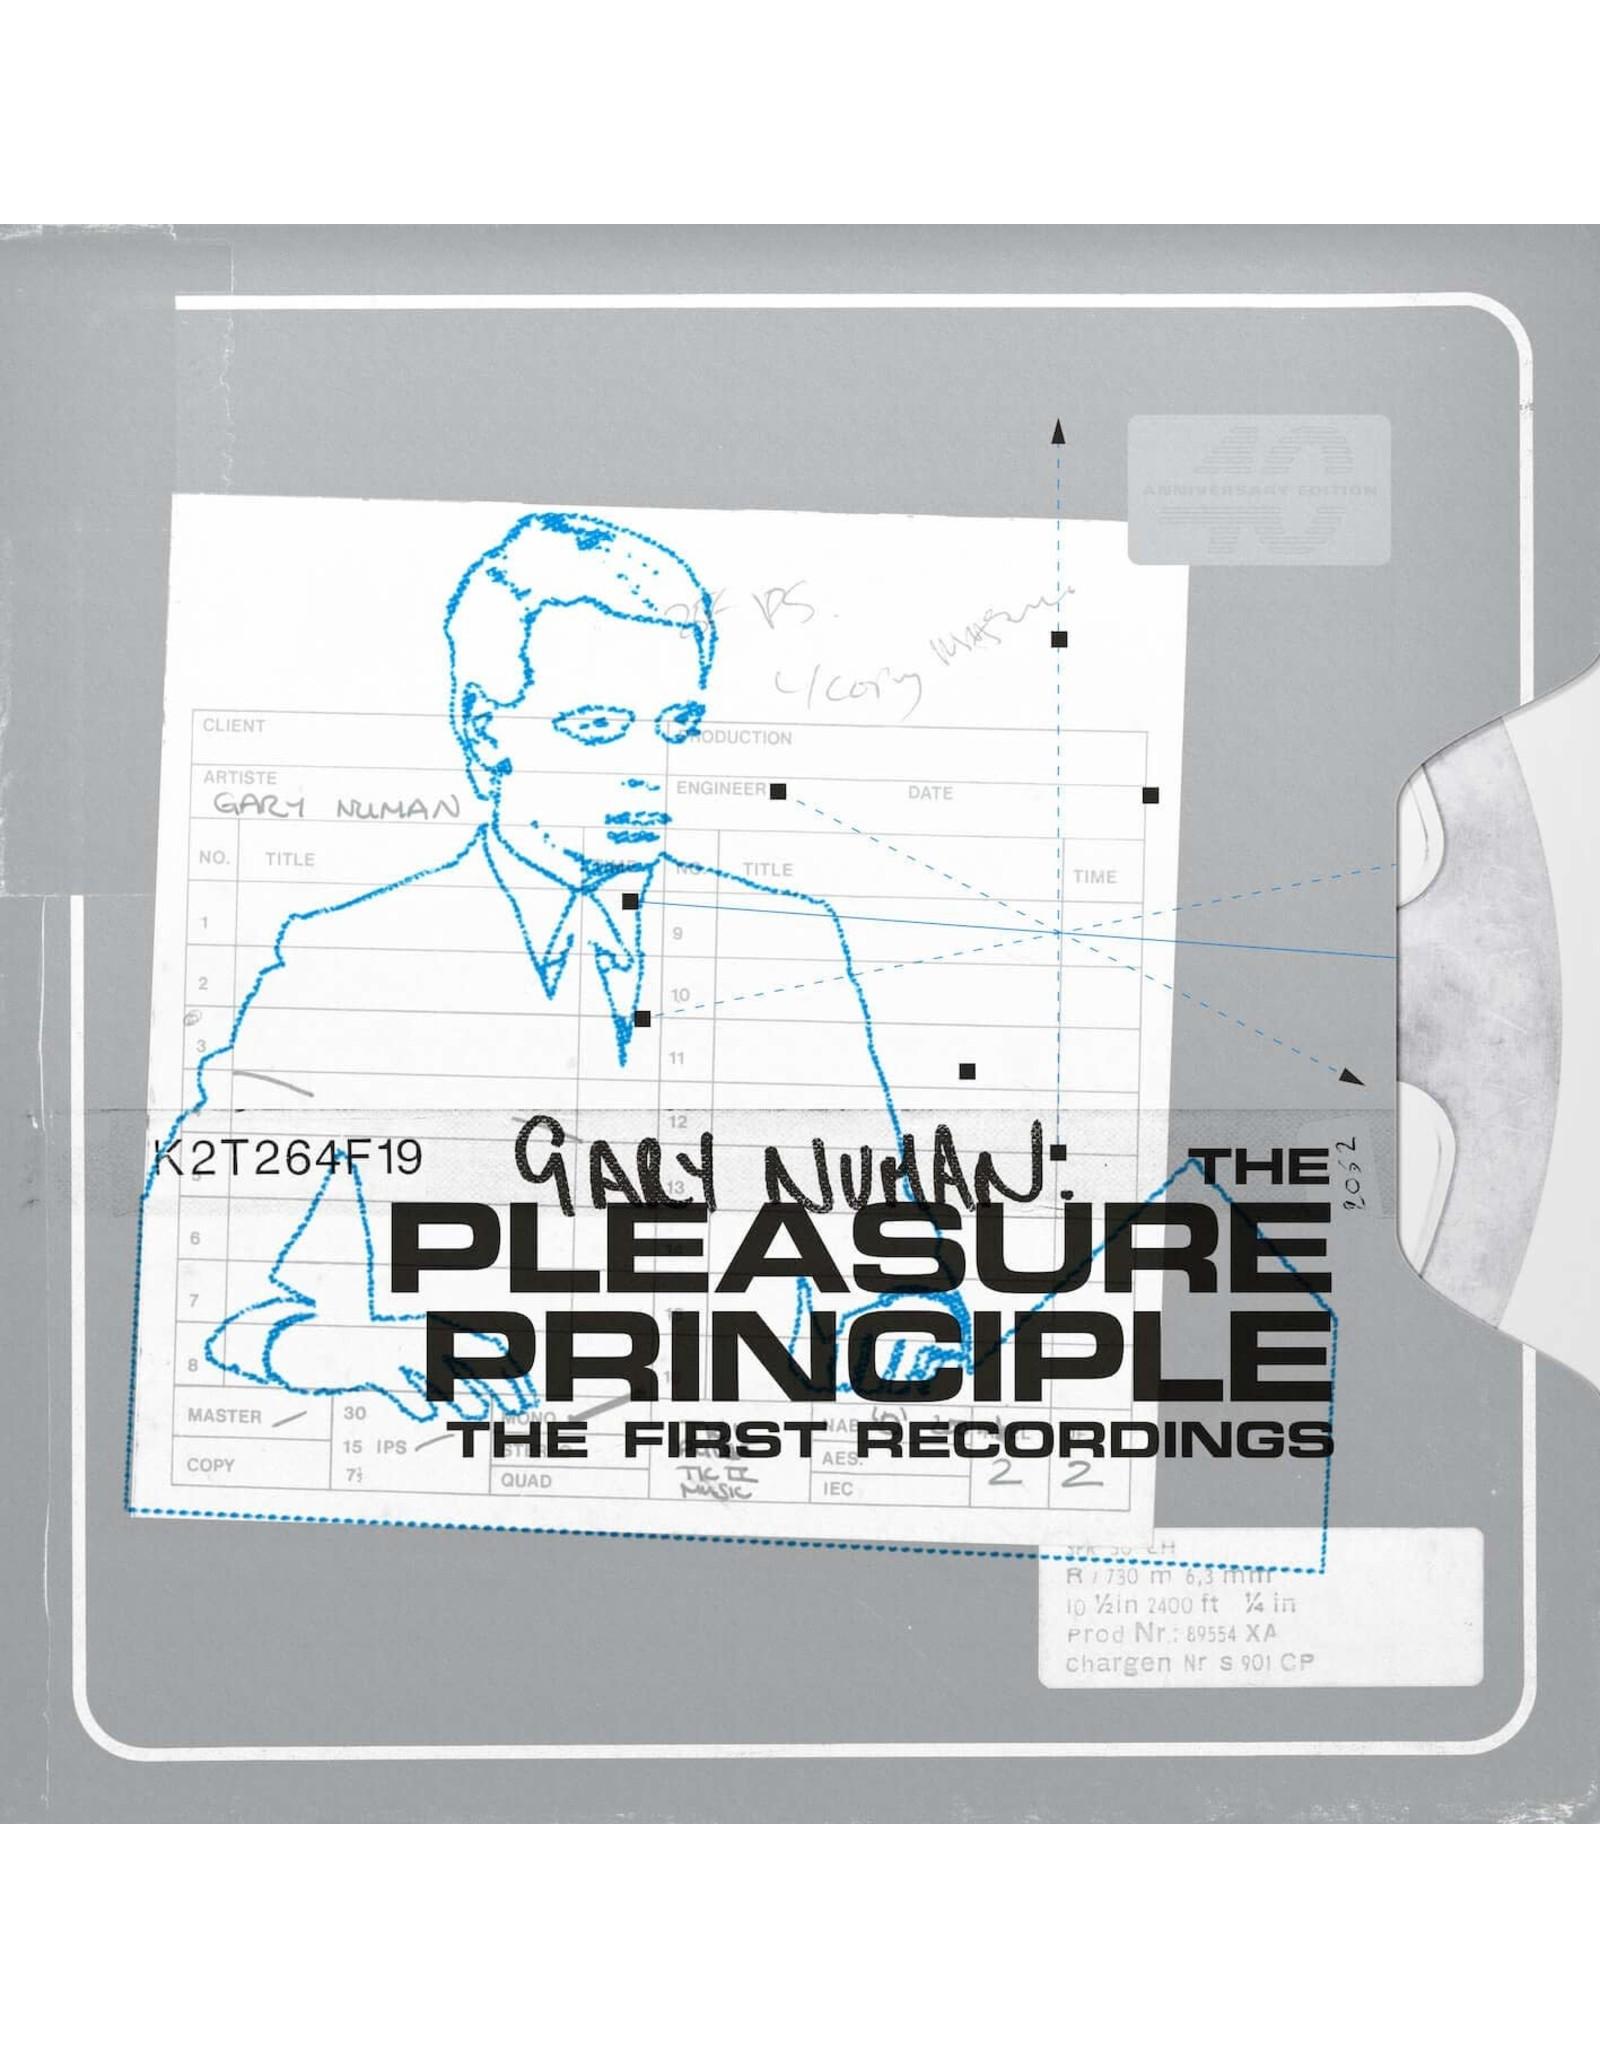 Gary Numan - Pleasure Principle: The First Recordings (Orange Vinyl)